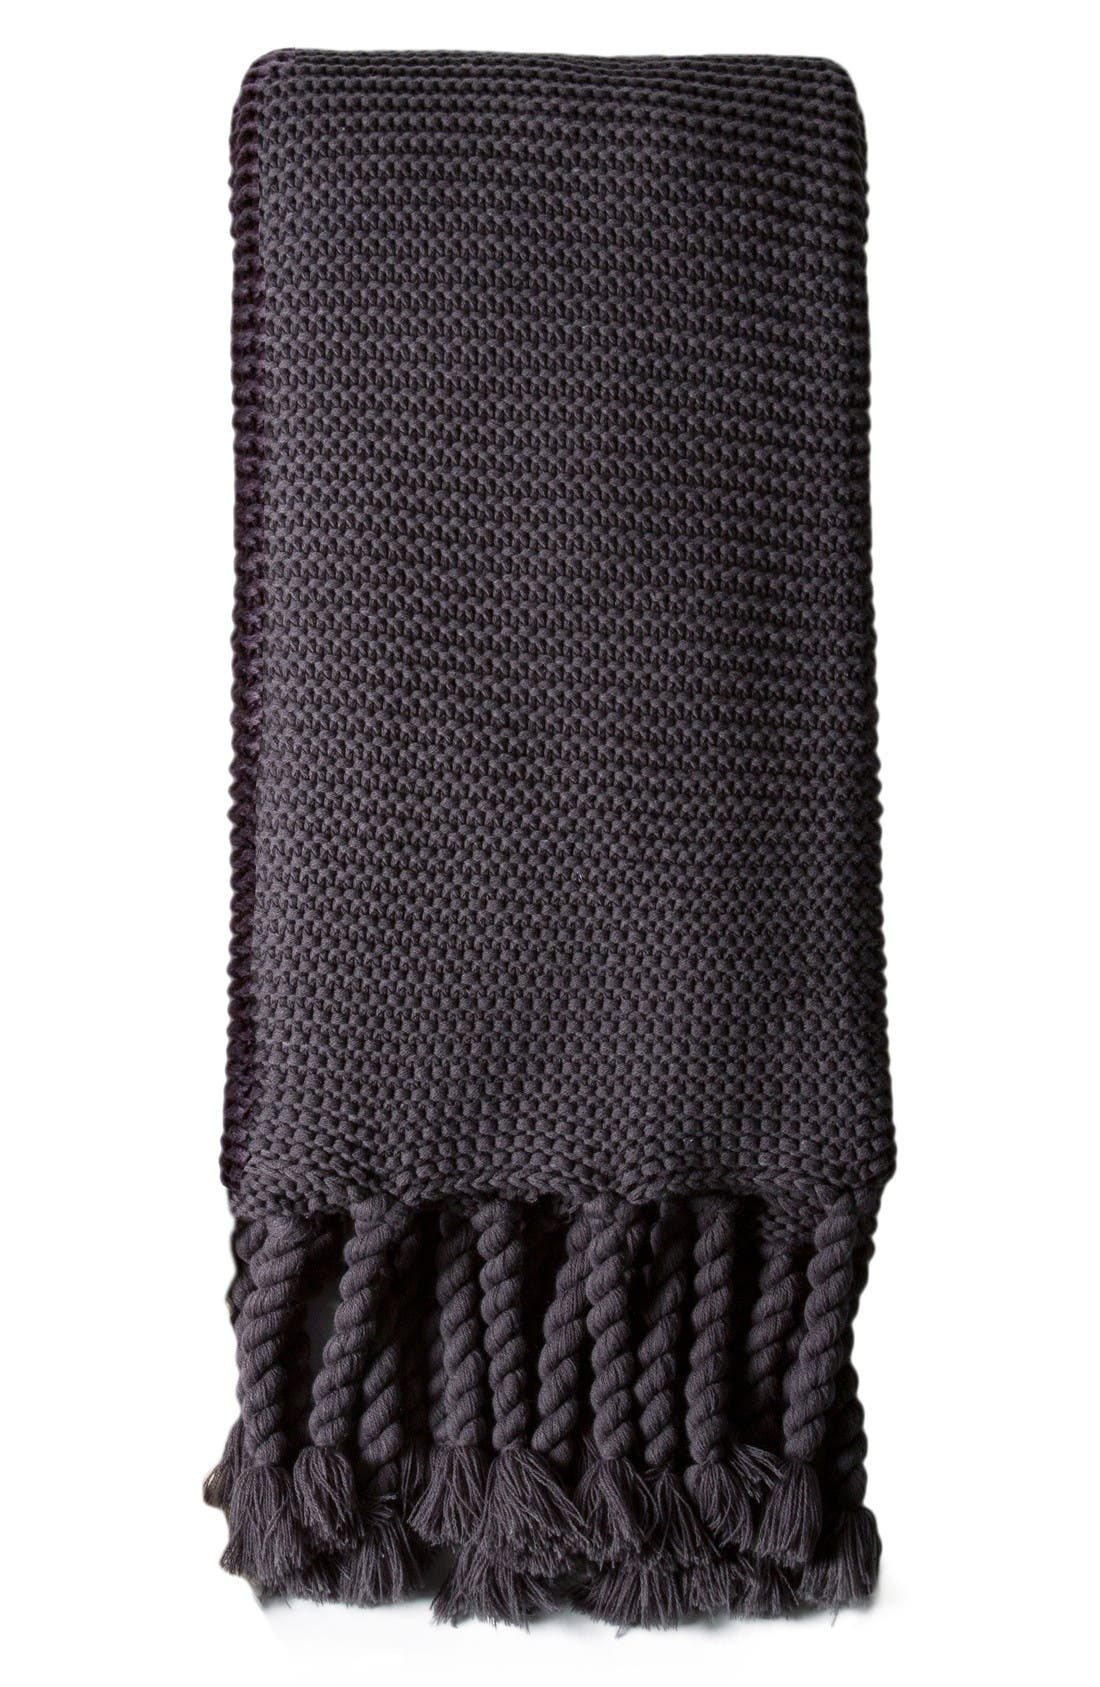 Alternate Image 1 Selected - Pom Pom At Home Trestles Oversize Throw Blanket